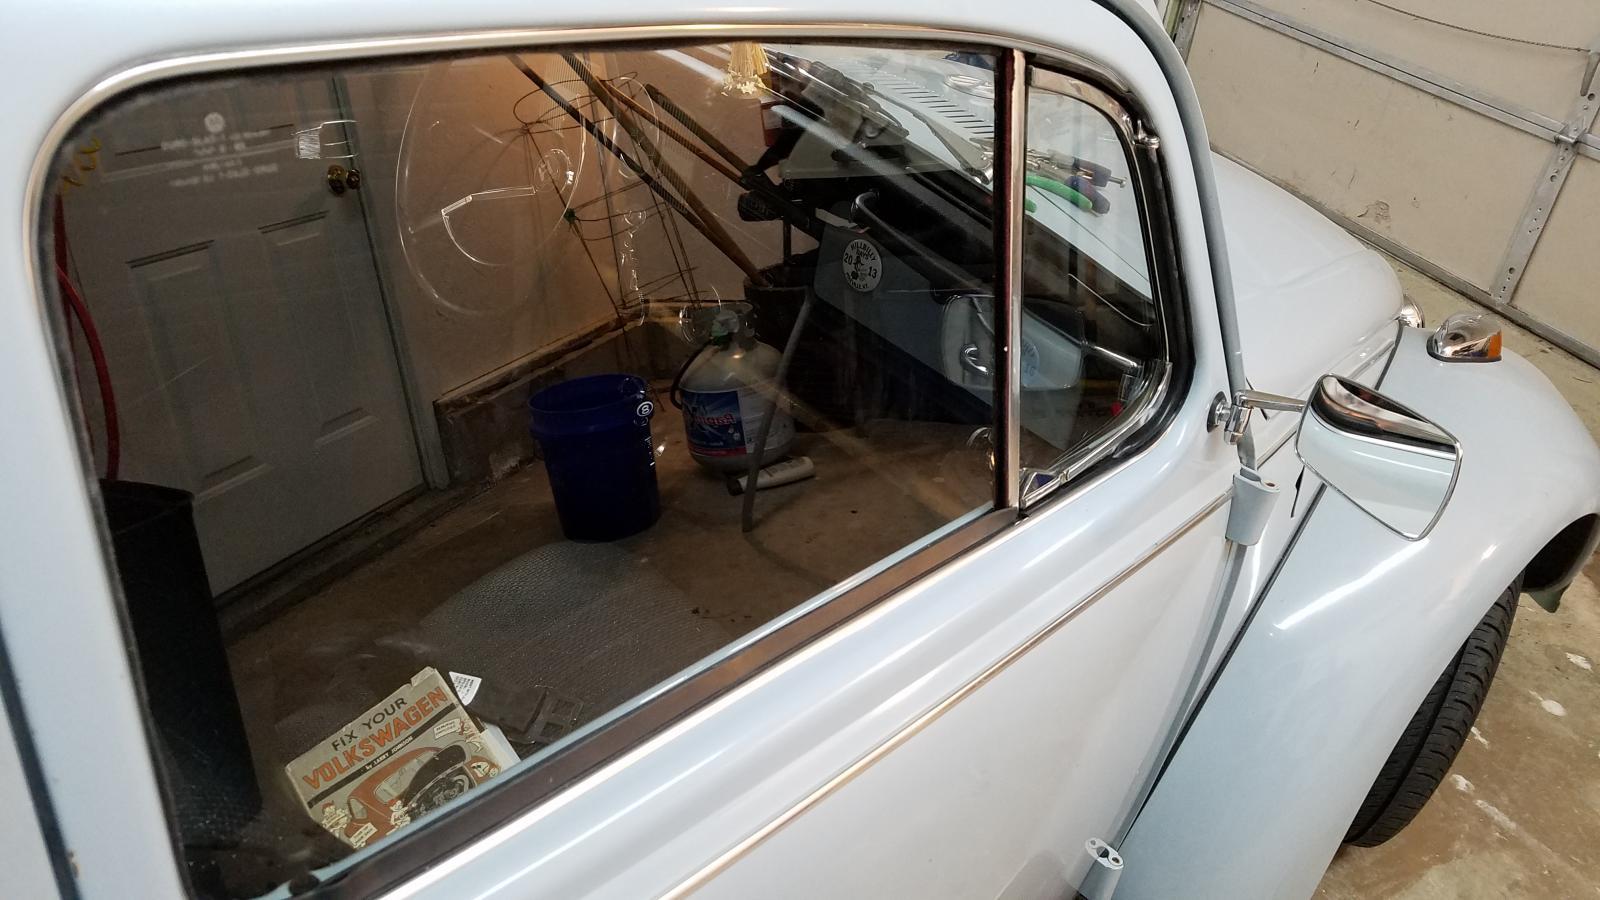 New Window Kit